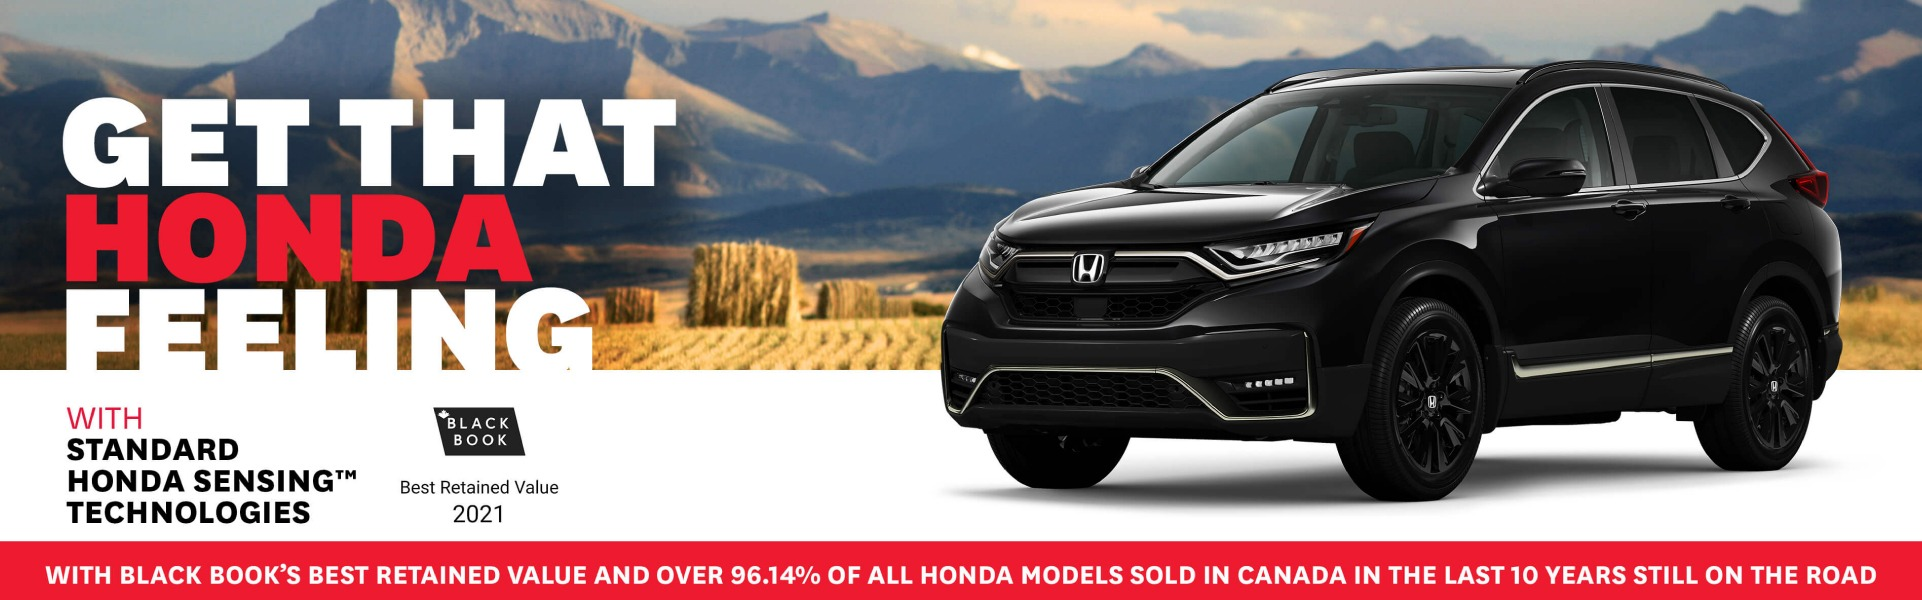 Get That Honda Feeling all June long.